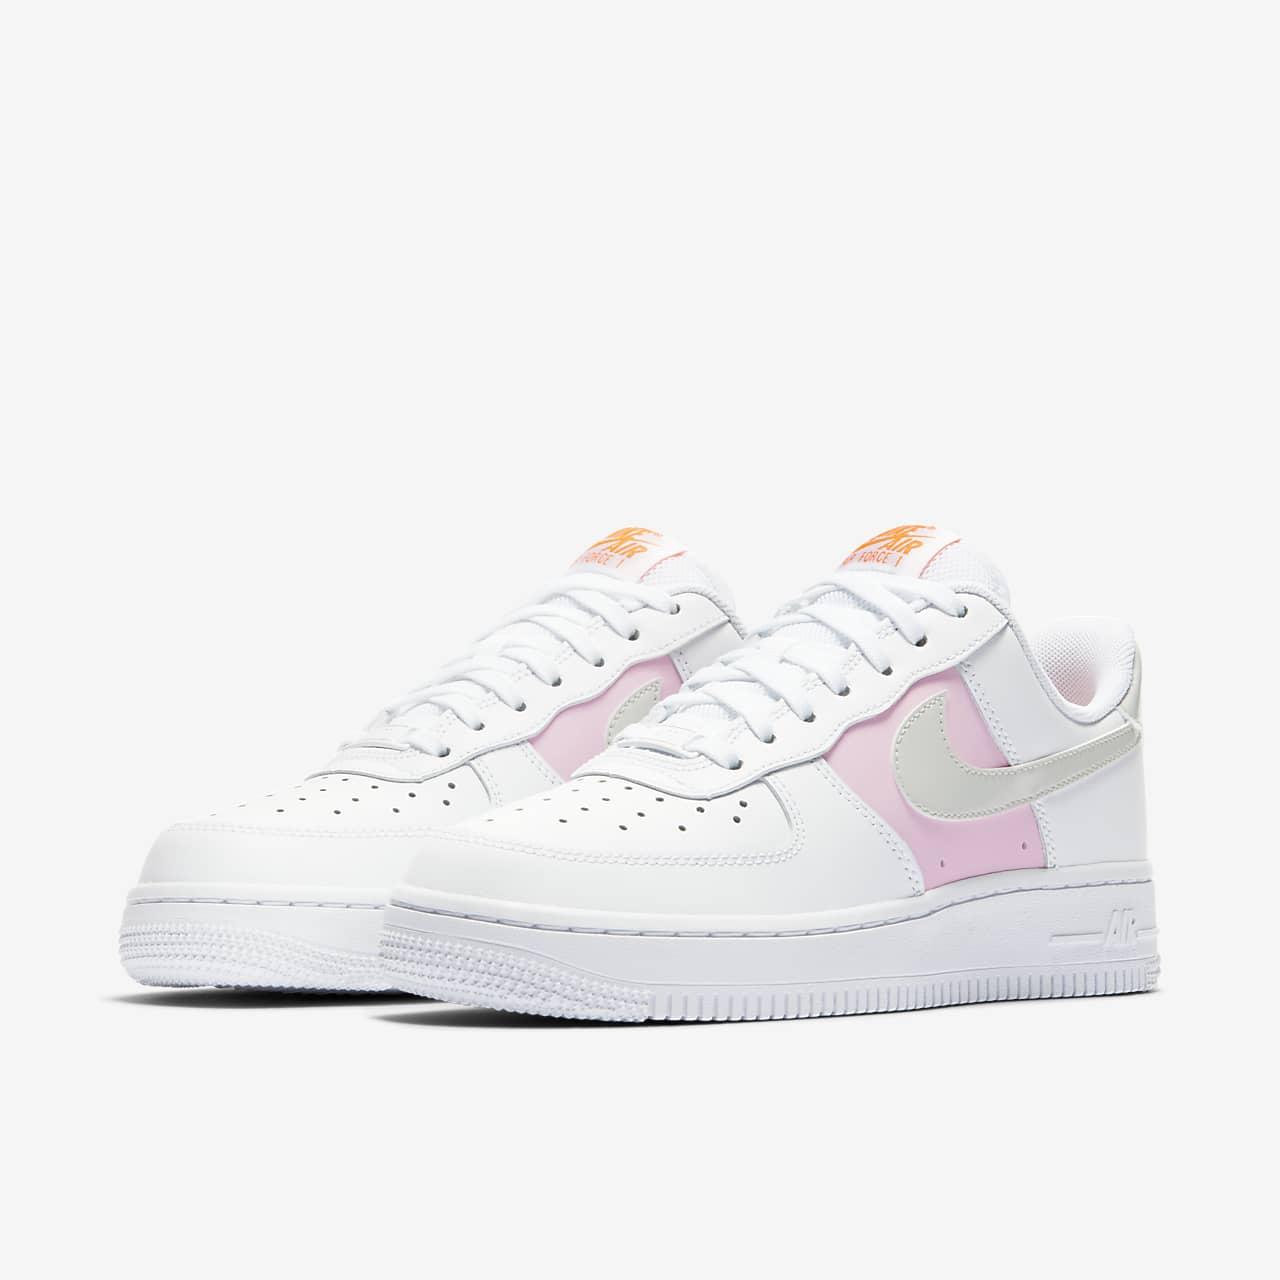 Nike Air Force 1 Női Cipők. Nike HU